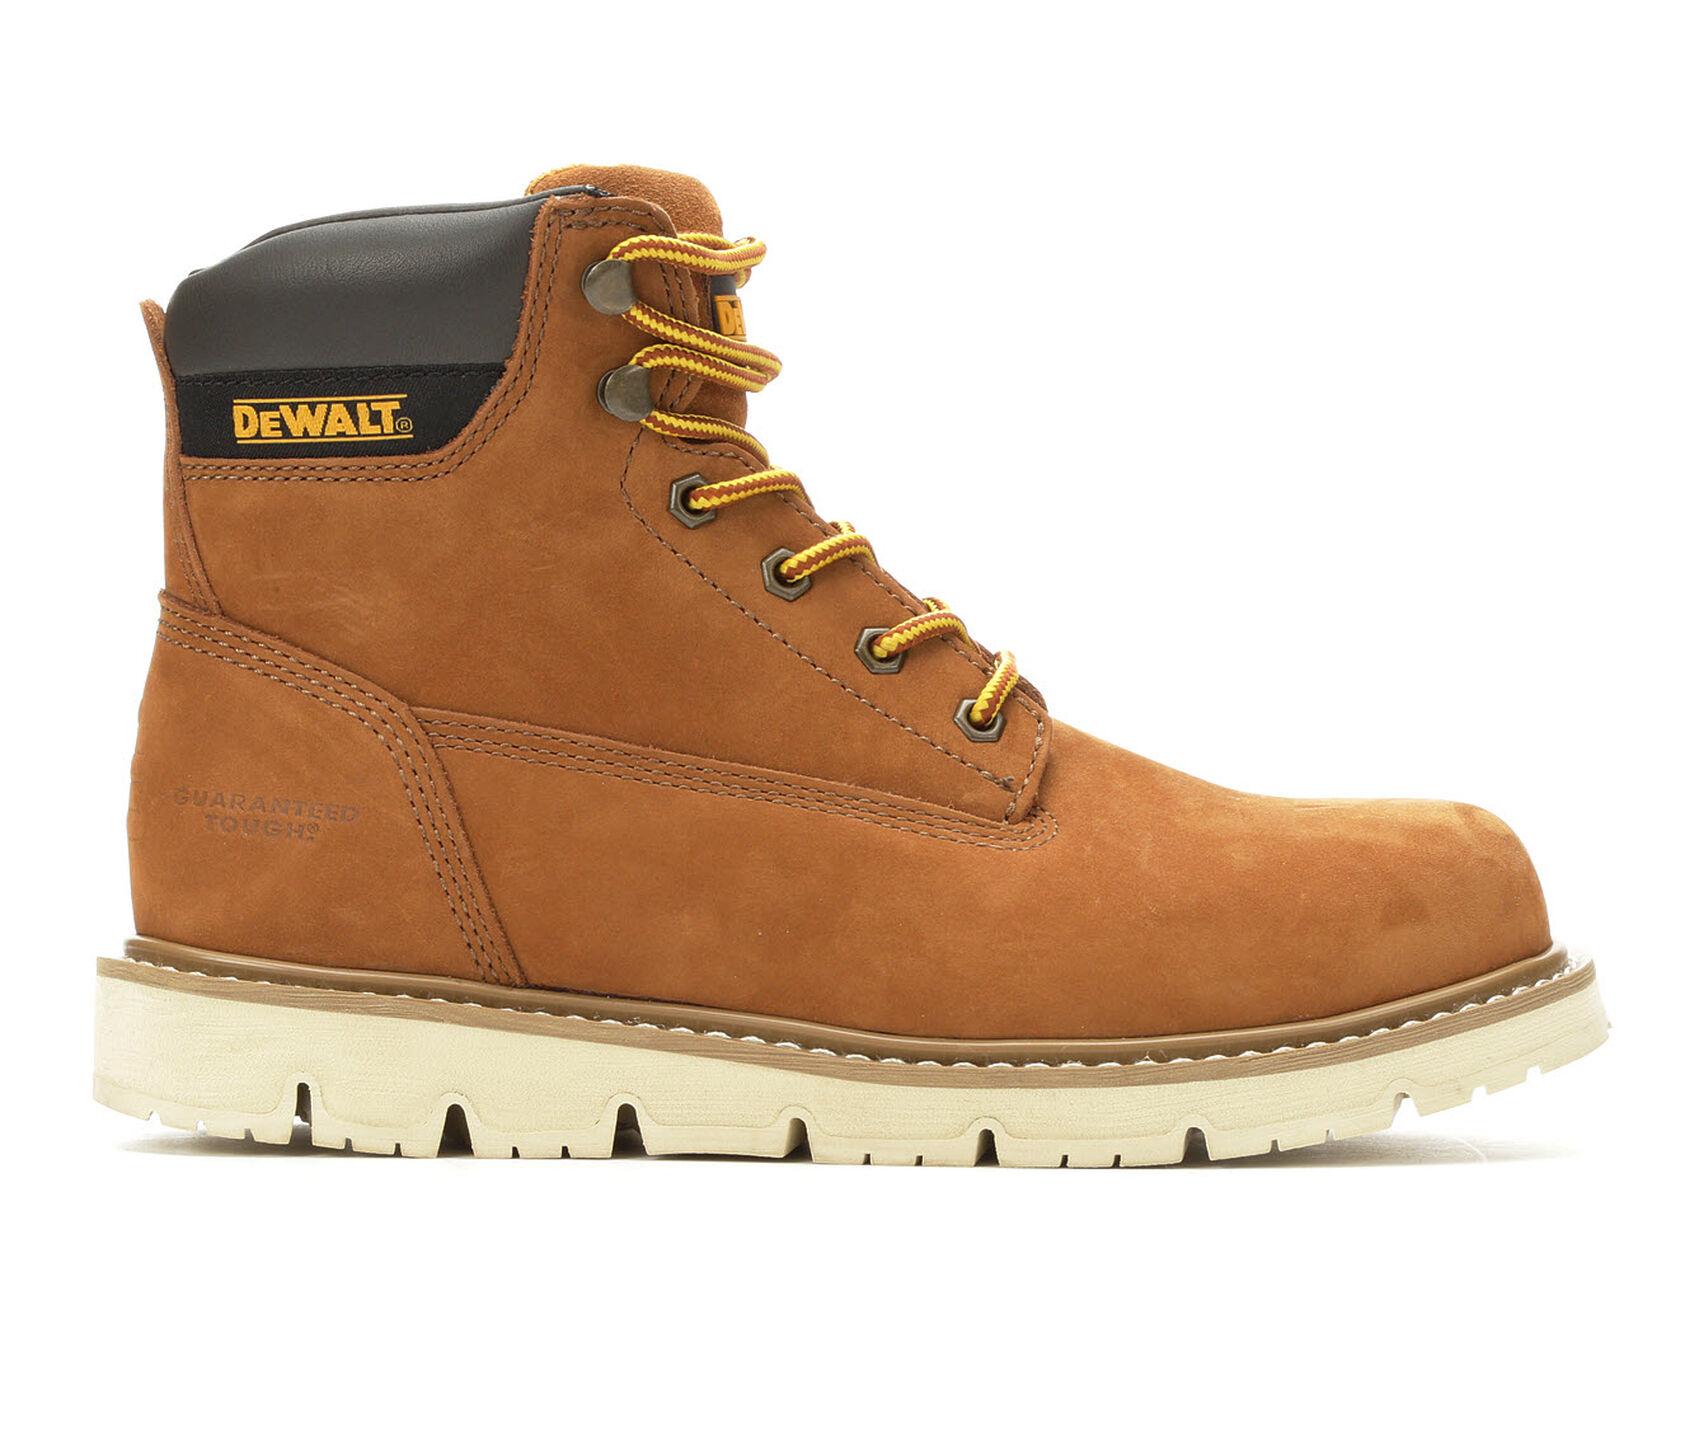 0356d57c57e Men's DeWALT Flex 6 Inch Steel Toe Work Boots